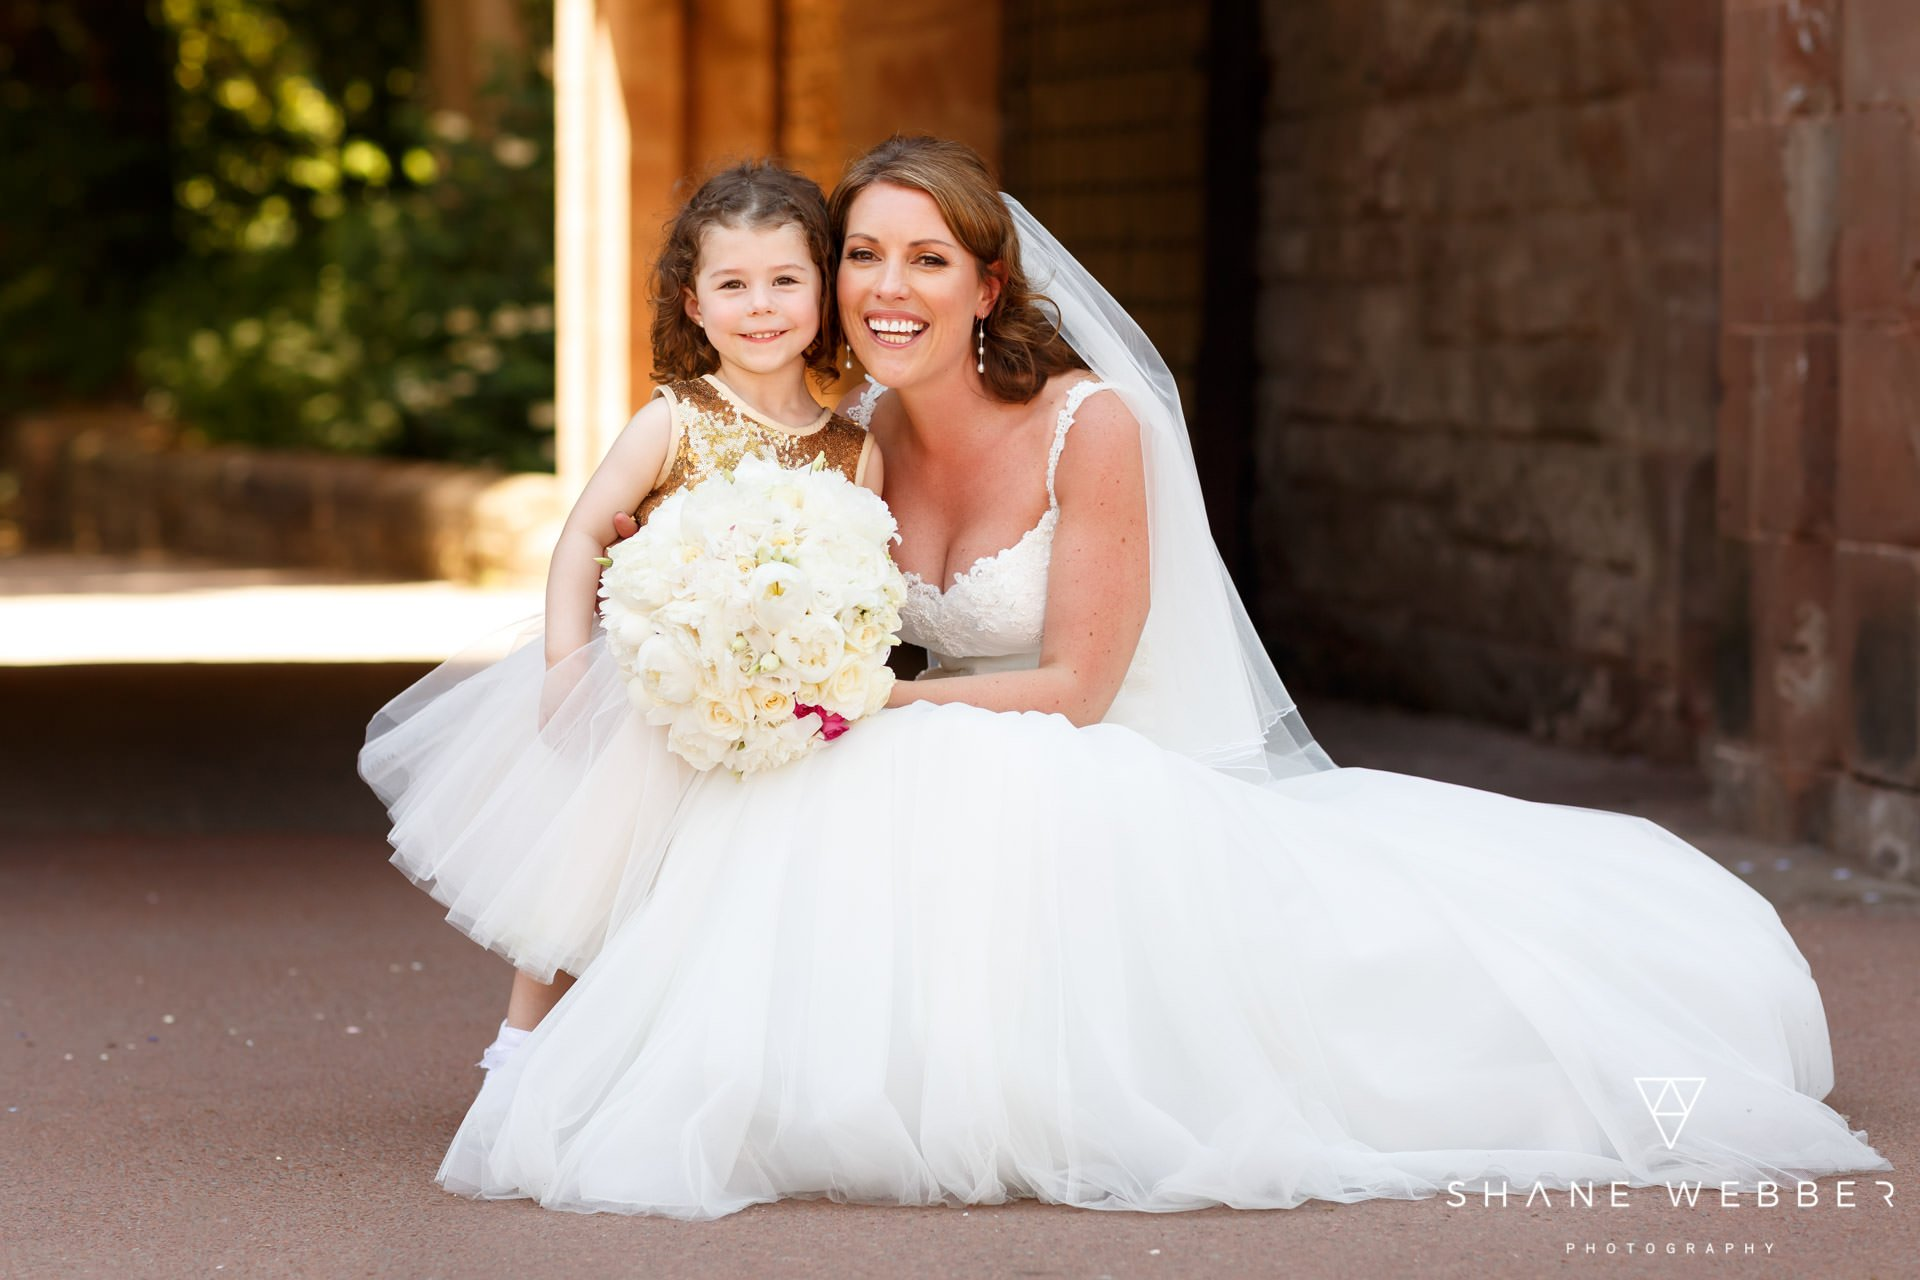 Award winning wedding planning services throughout Cheshire